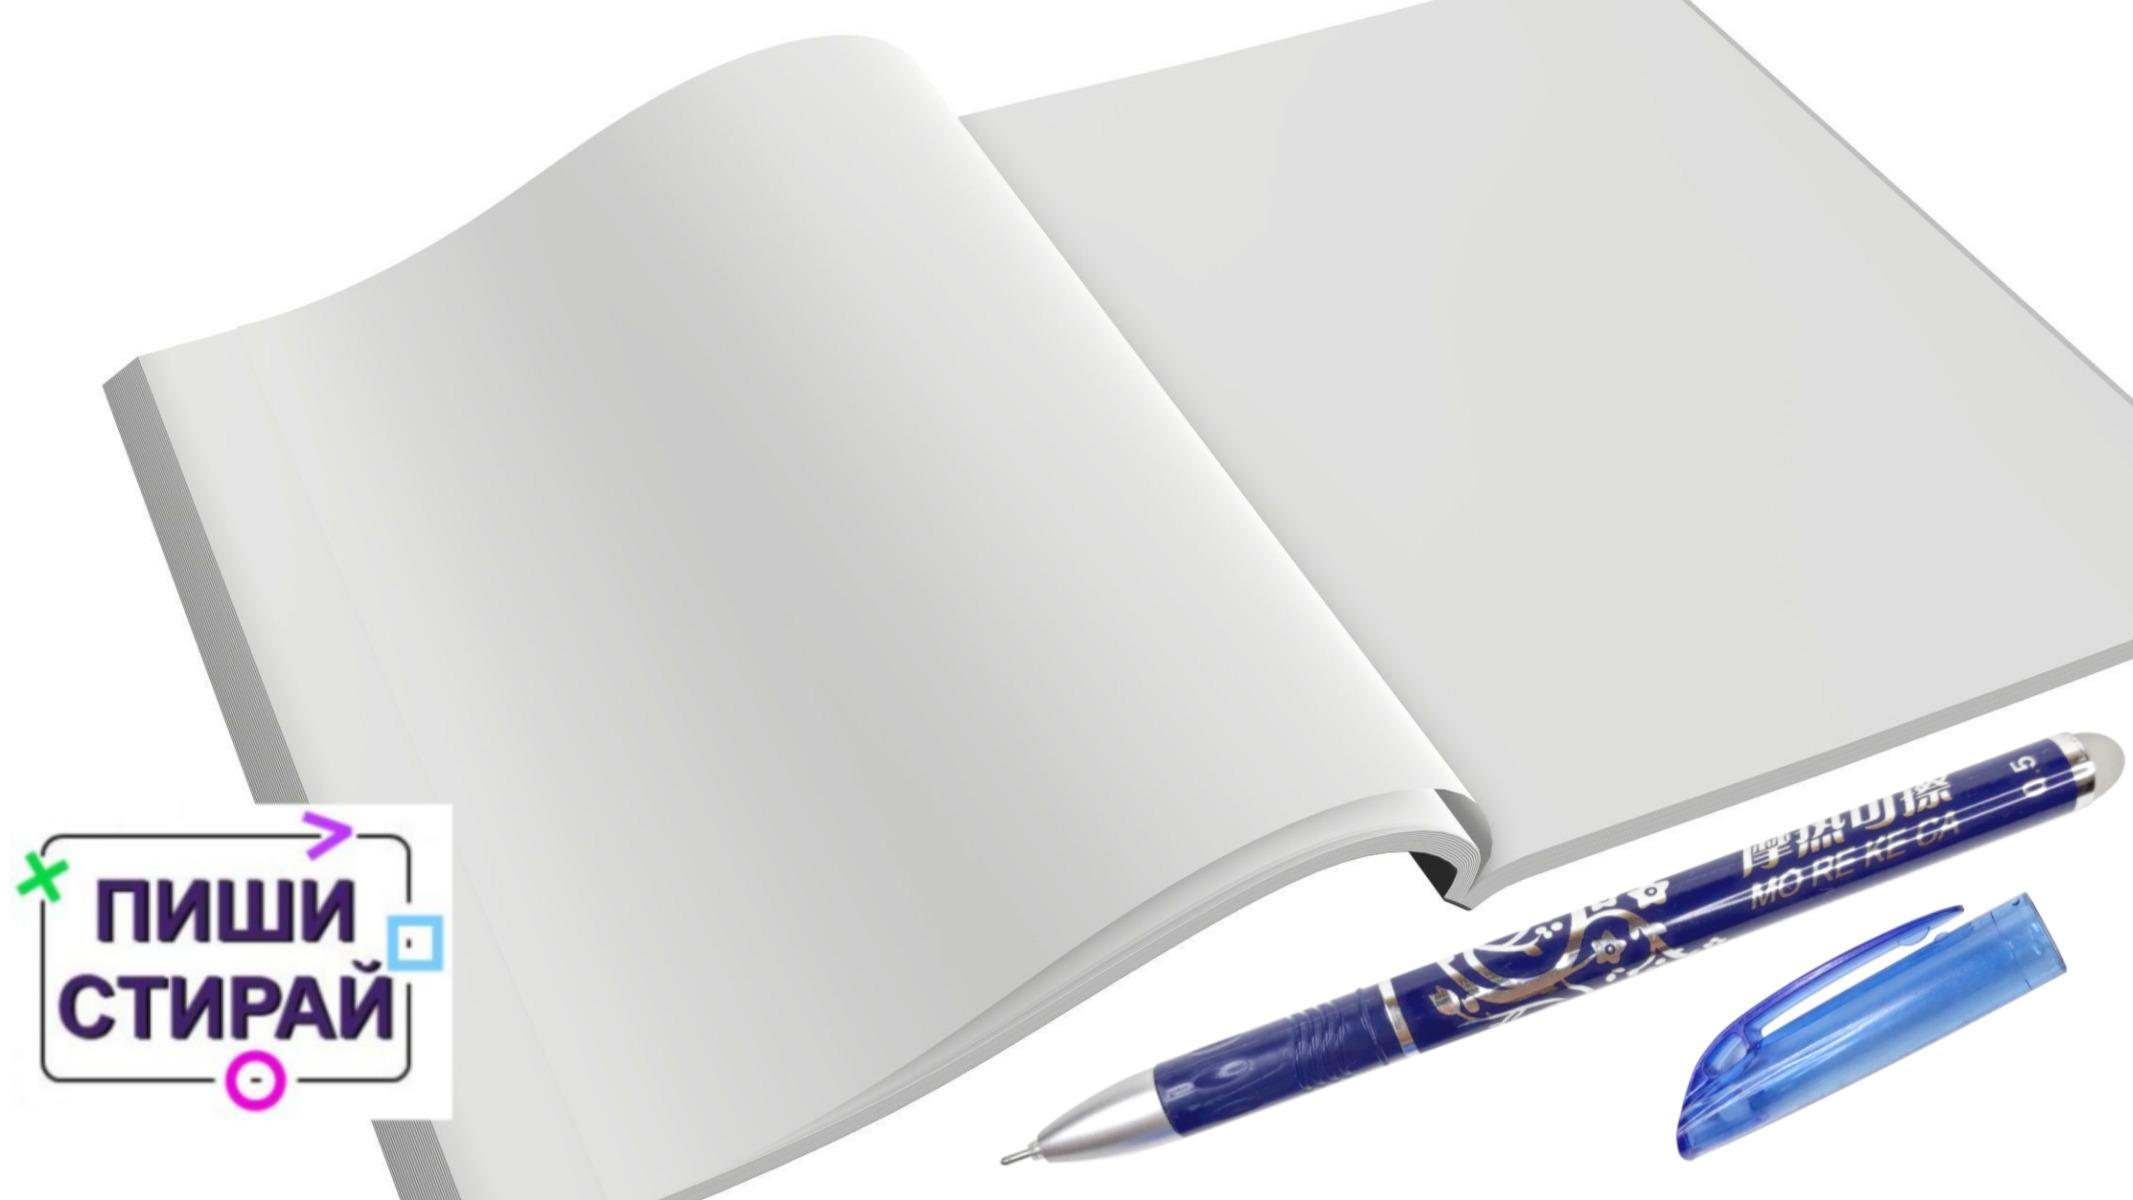 Чистая и аккуратная тетрадь на 5+